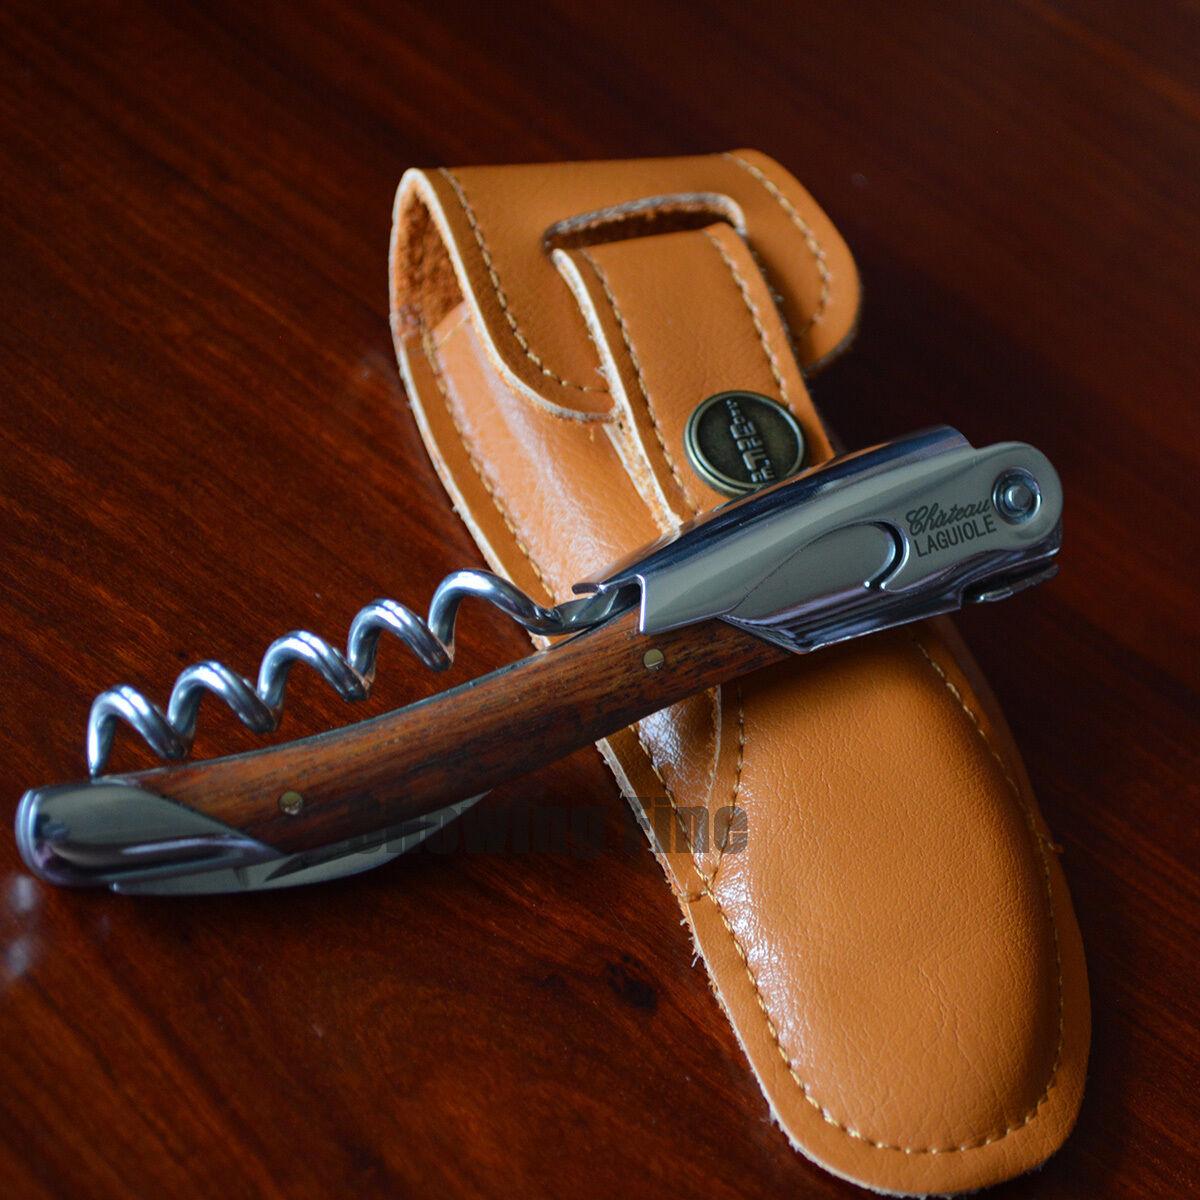 Pulltex Pulltaps Rosewood Toledo Hand Made Corkscrew with Leather Case Set